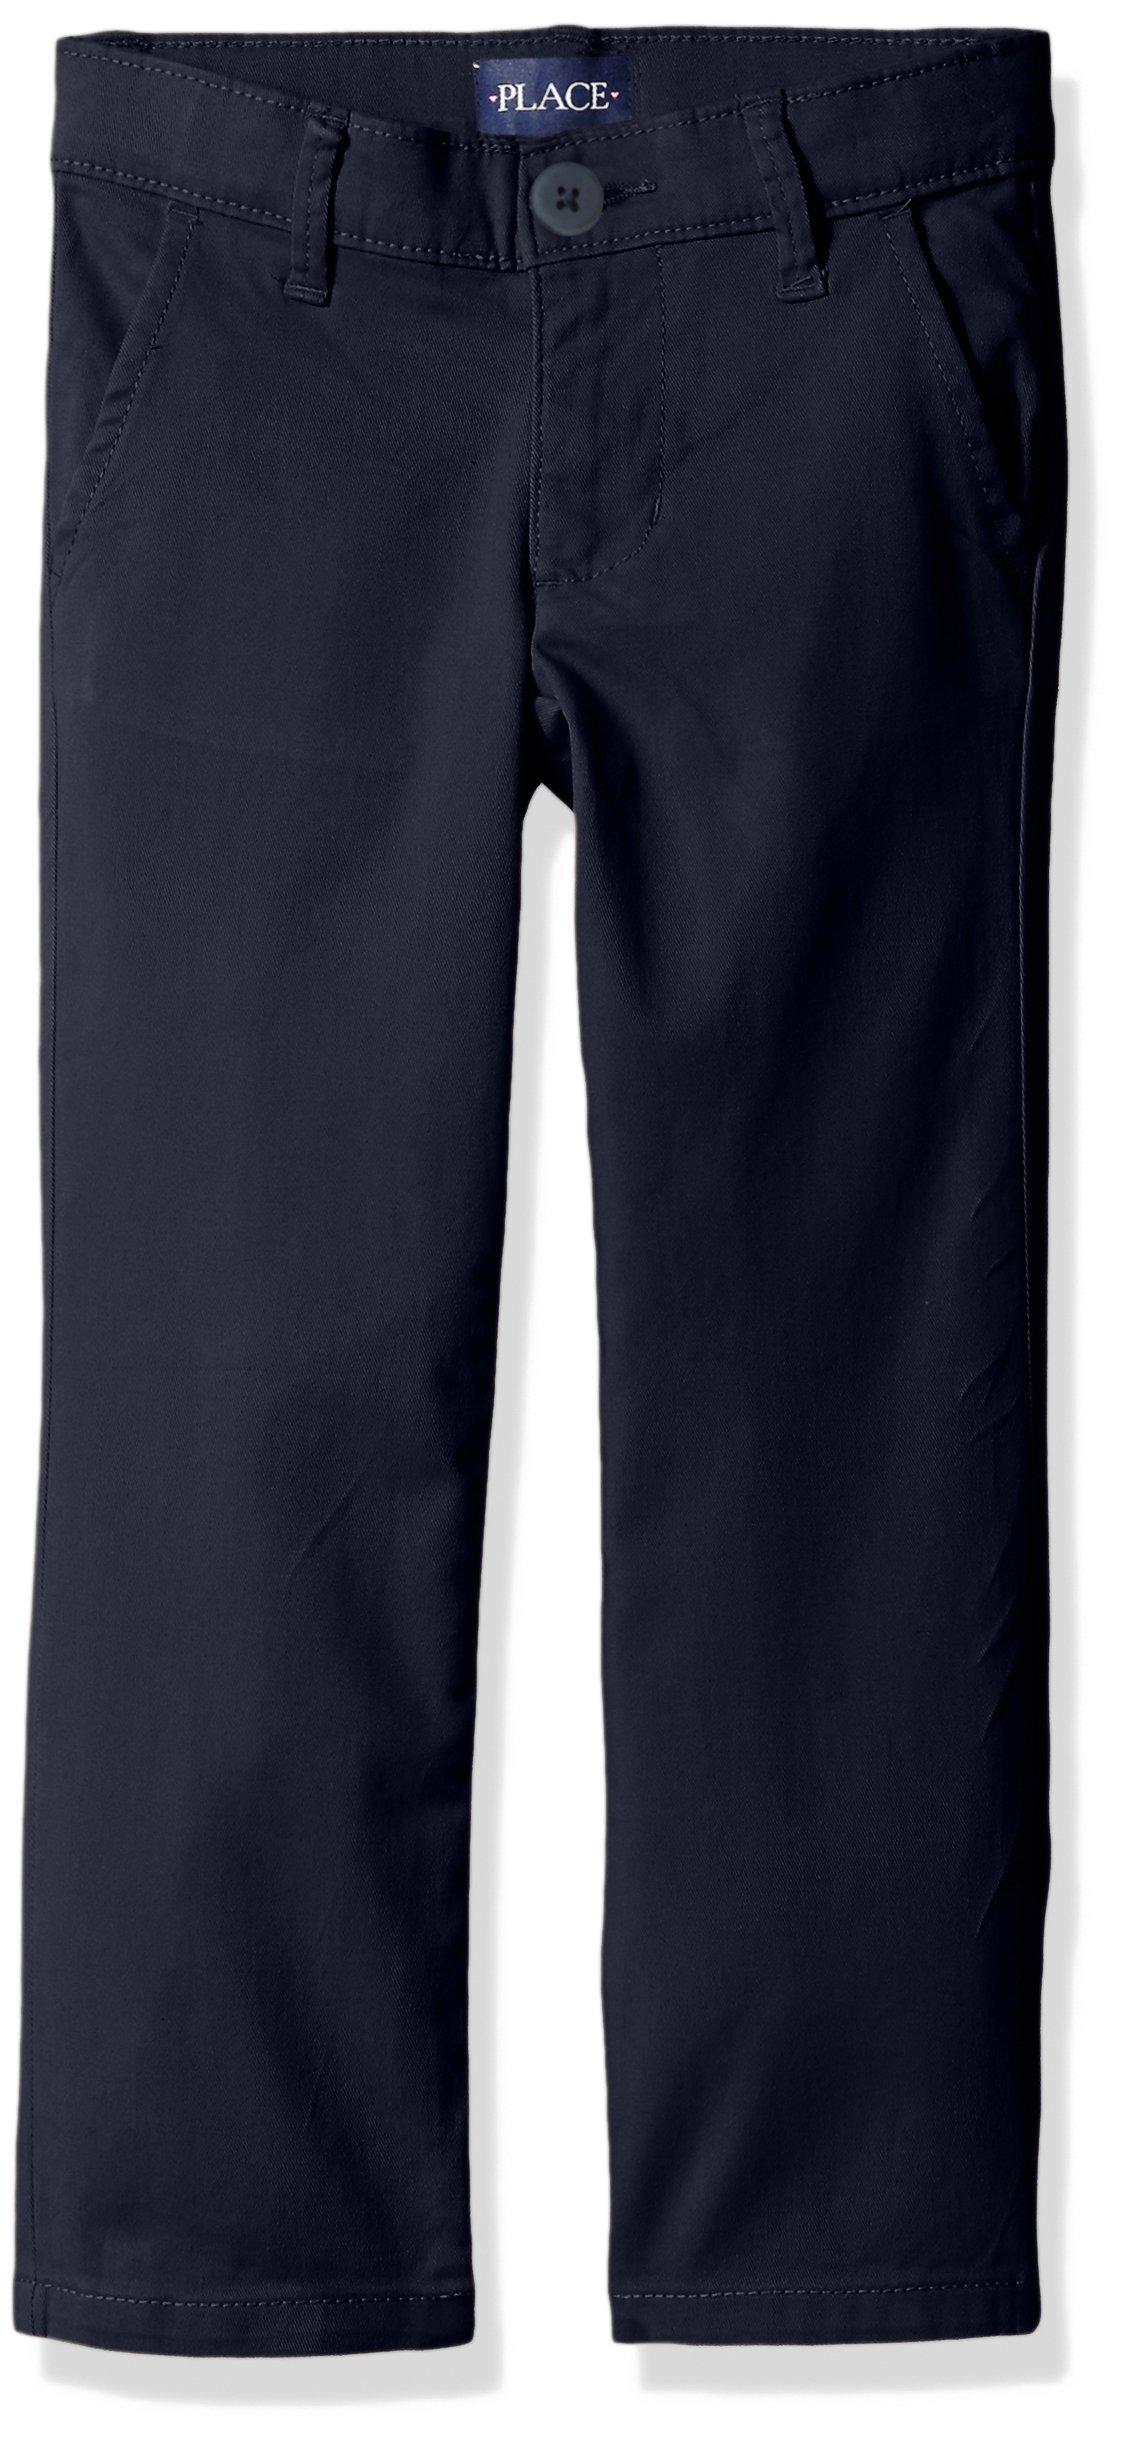 The Children's Place Girls' Skinny Uniform Pant